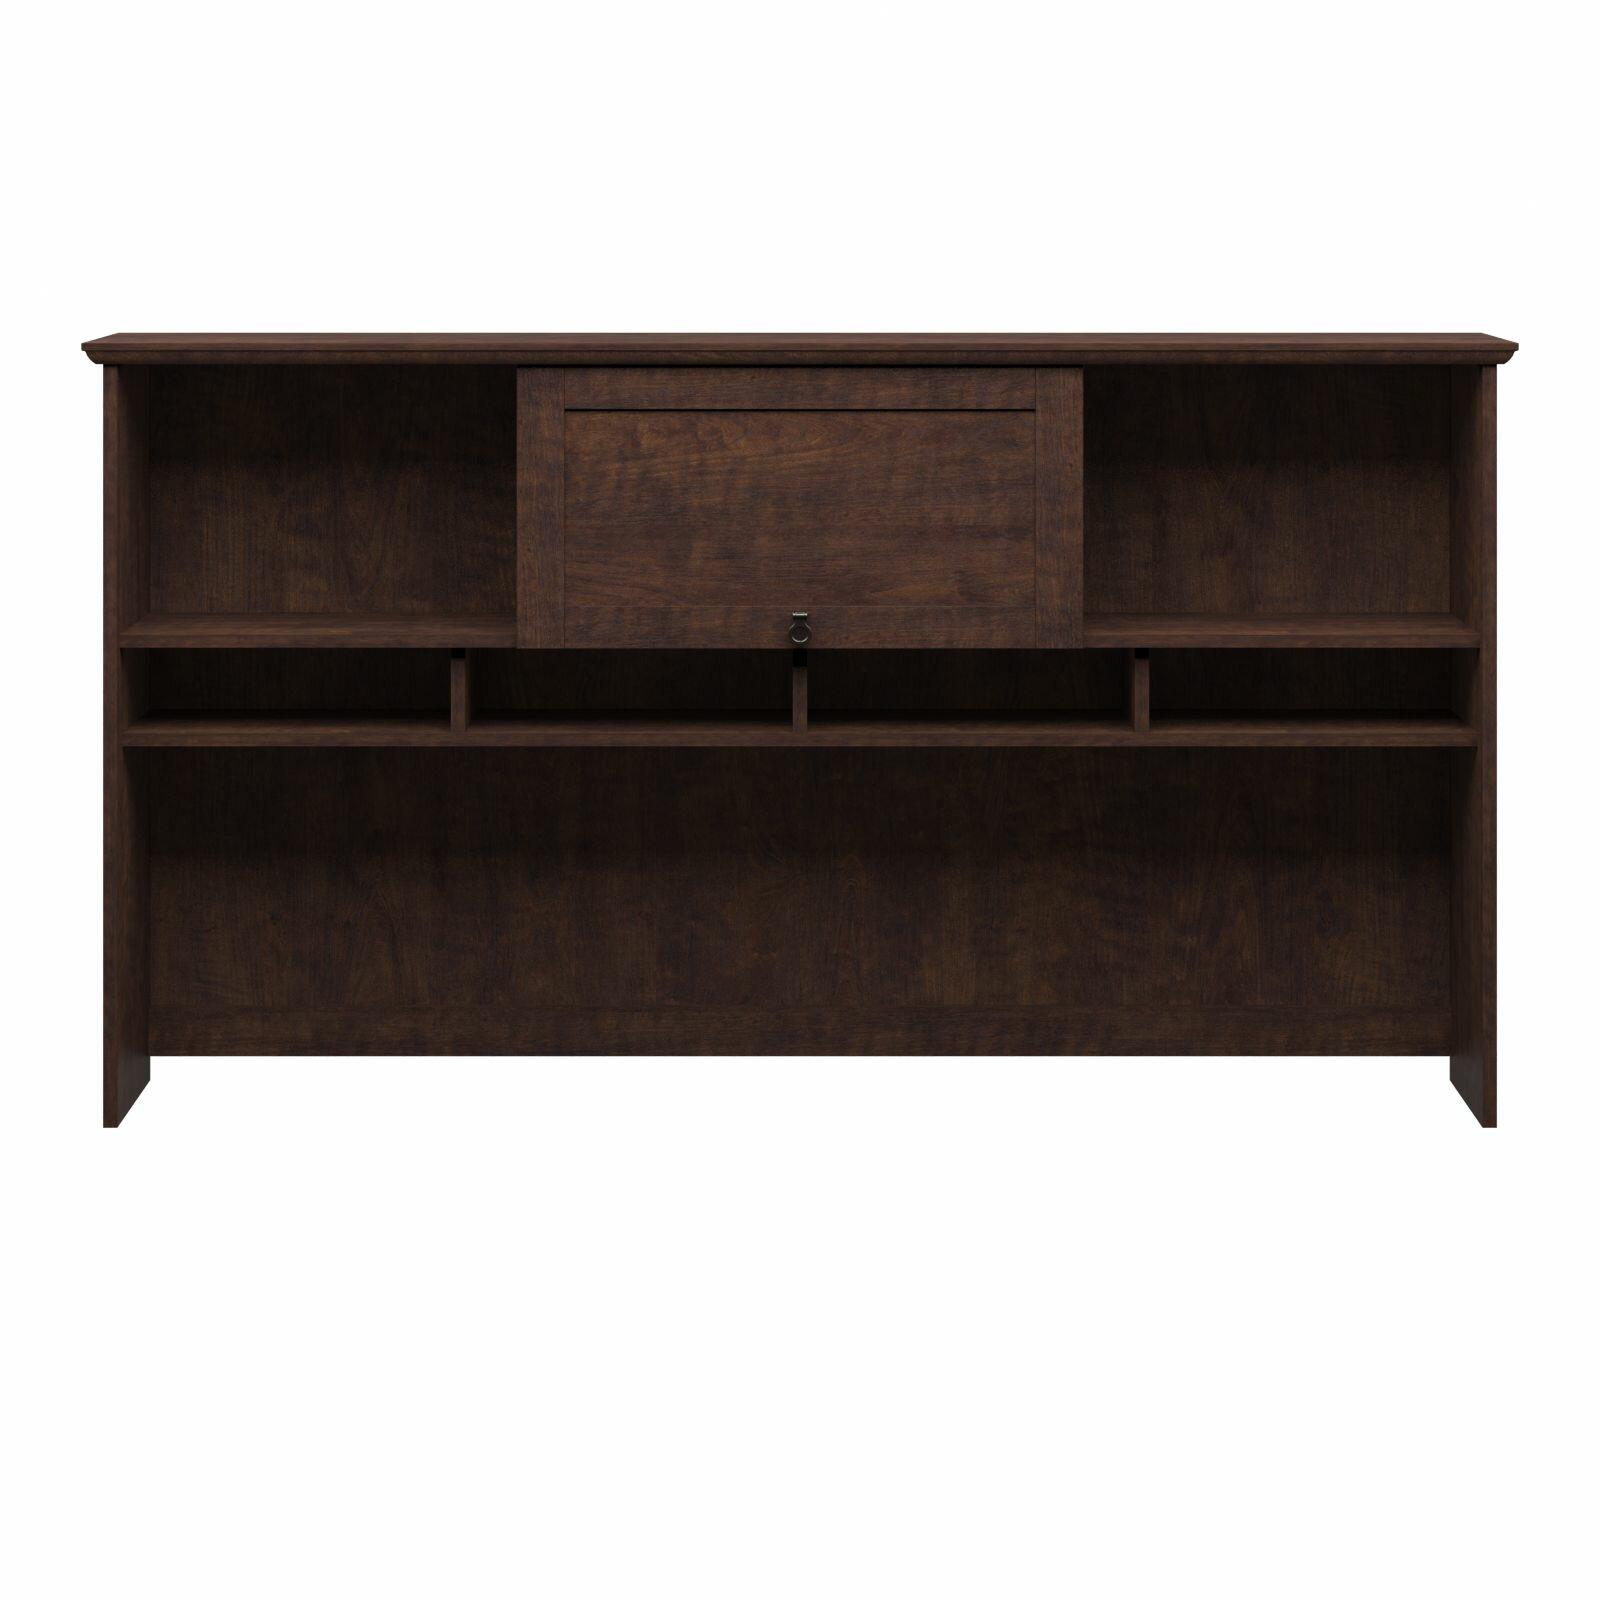 Darby Home Co Egger 36 X 60 Desk Hutch Reviews